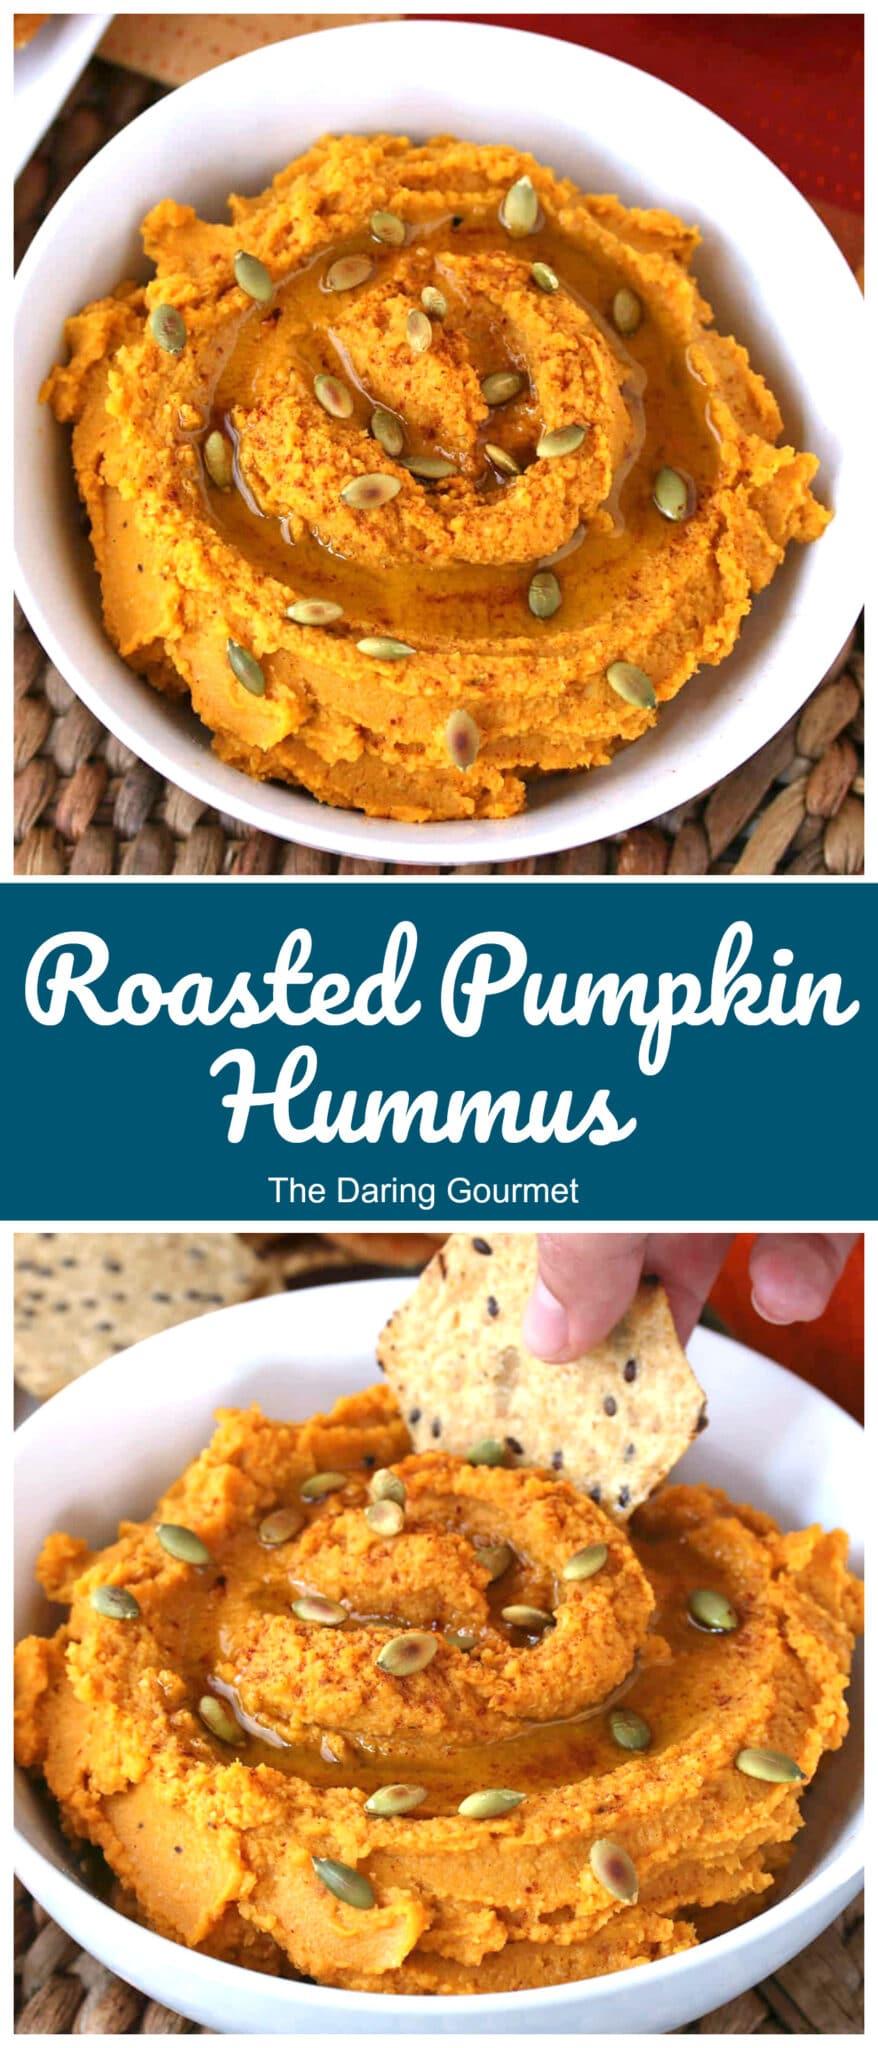 pumpkin hummus recipe roasted dip tahini garbanzo beans chickpeas vegan vegetarian healthy